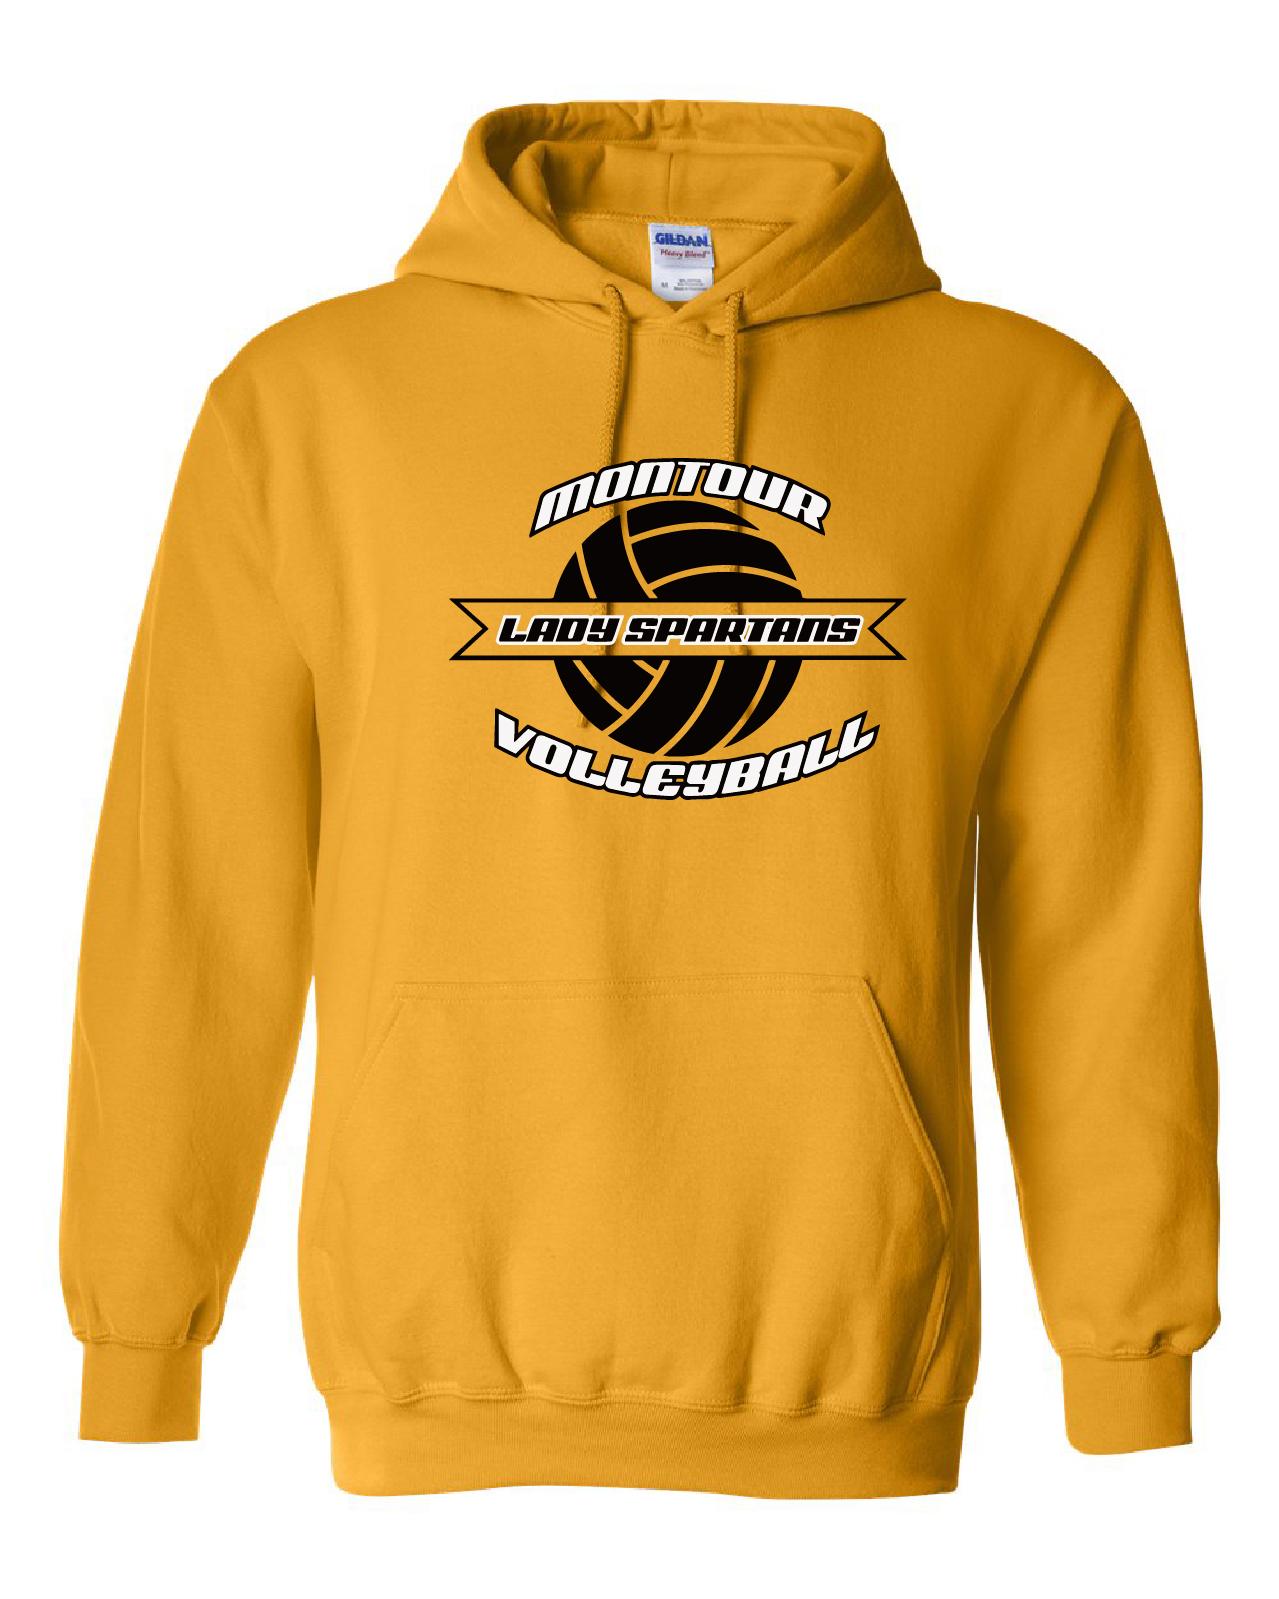 Gildan - Heavy Blend Hooded Sweatshirt DESIGN B